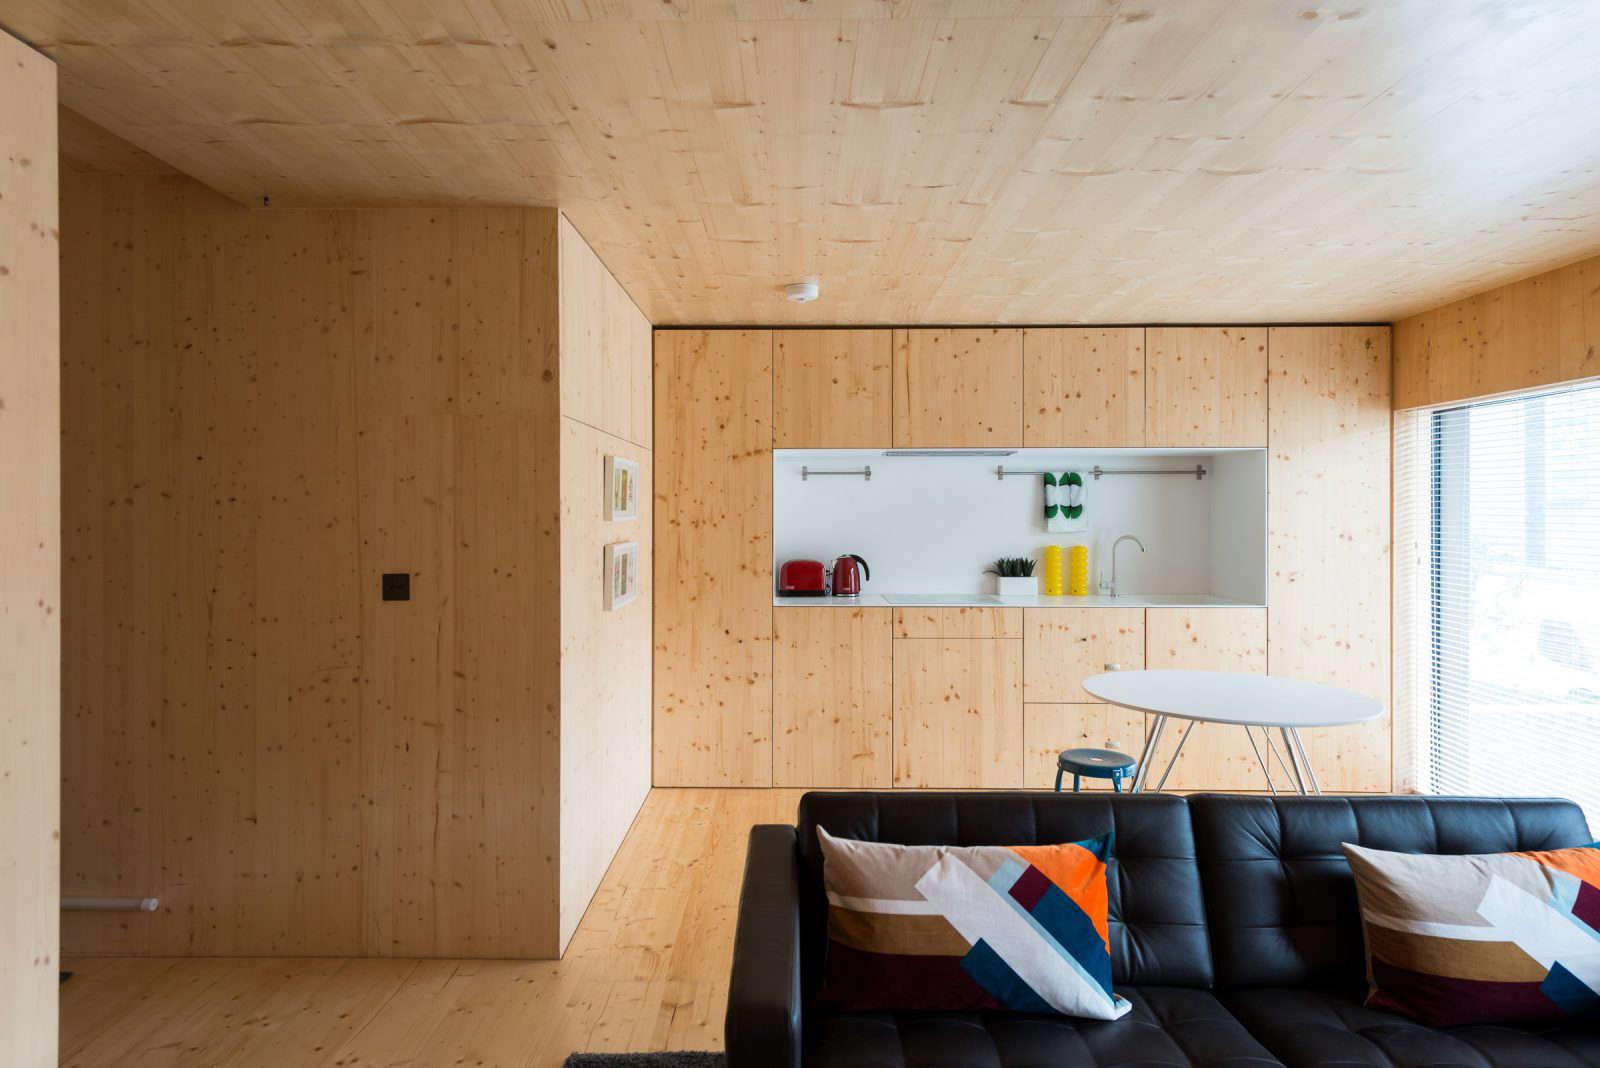 Amin Taha Spruce Apartment Kitchen In London